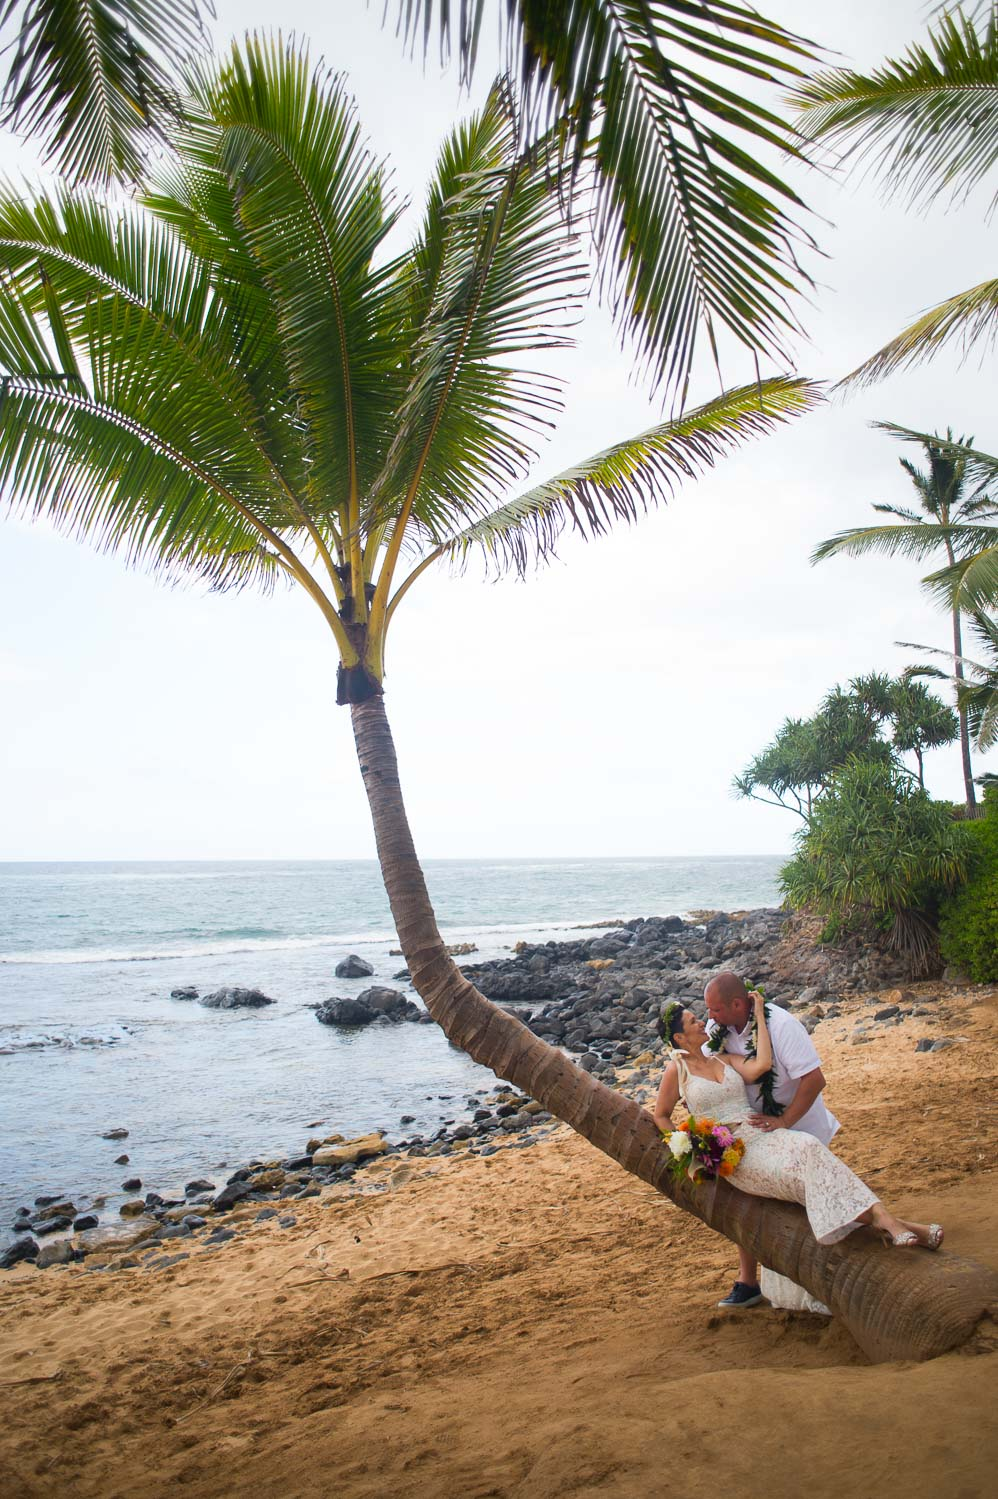 maui-wedding-photography-maui-wedding-venue-Tad-Craig-Photography-45.jpg